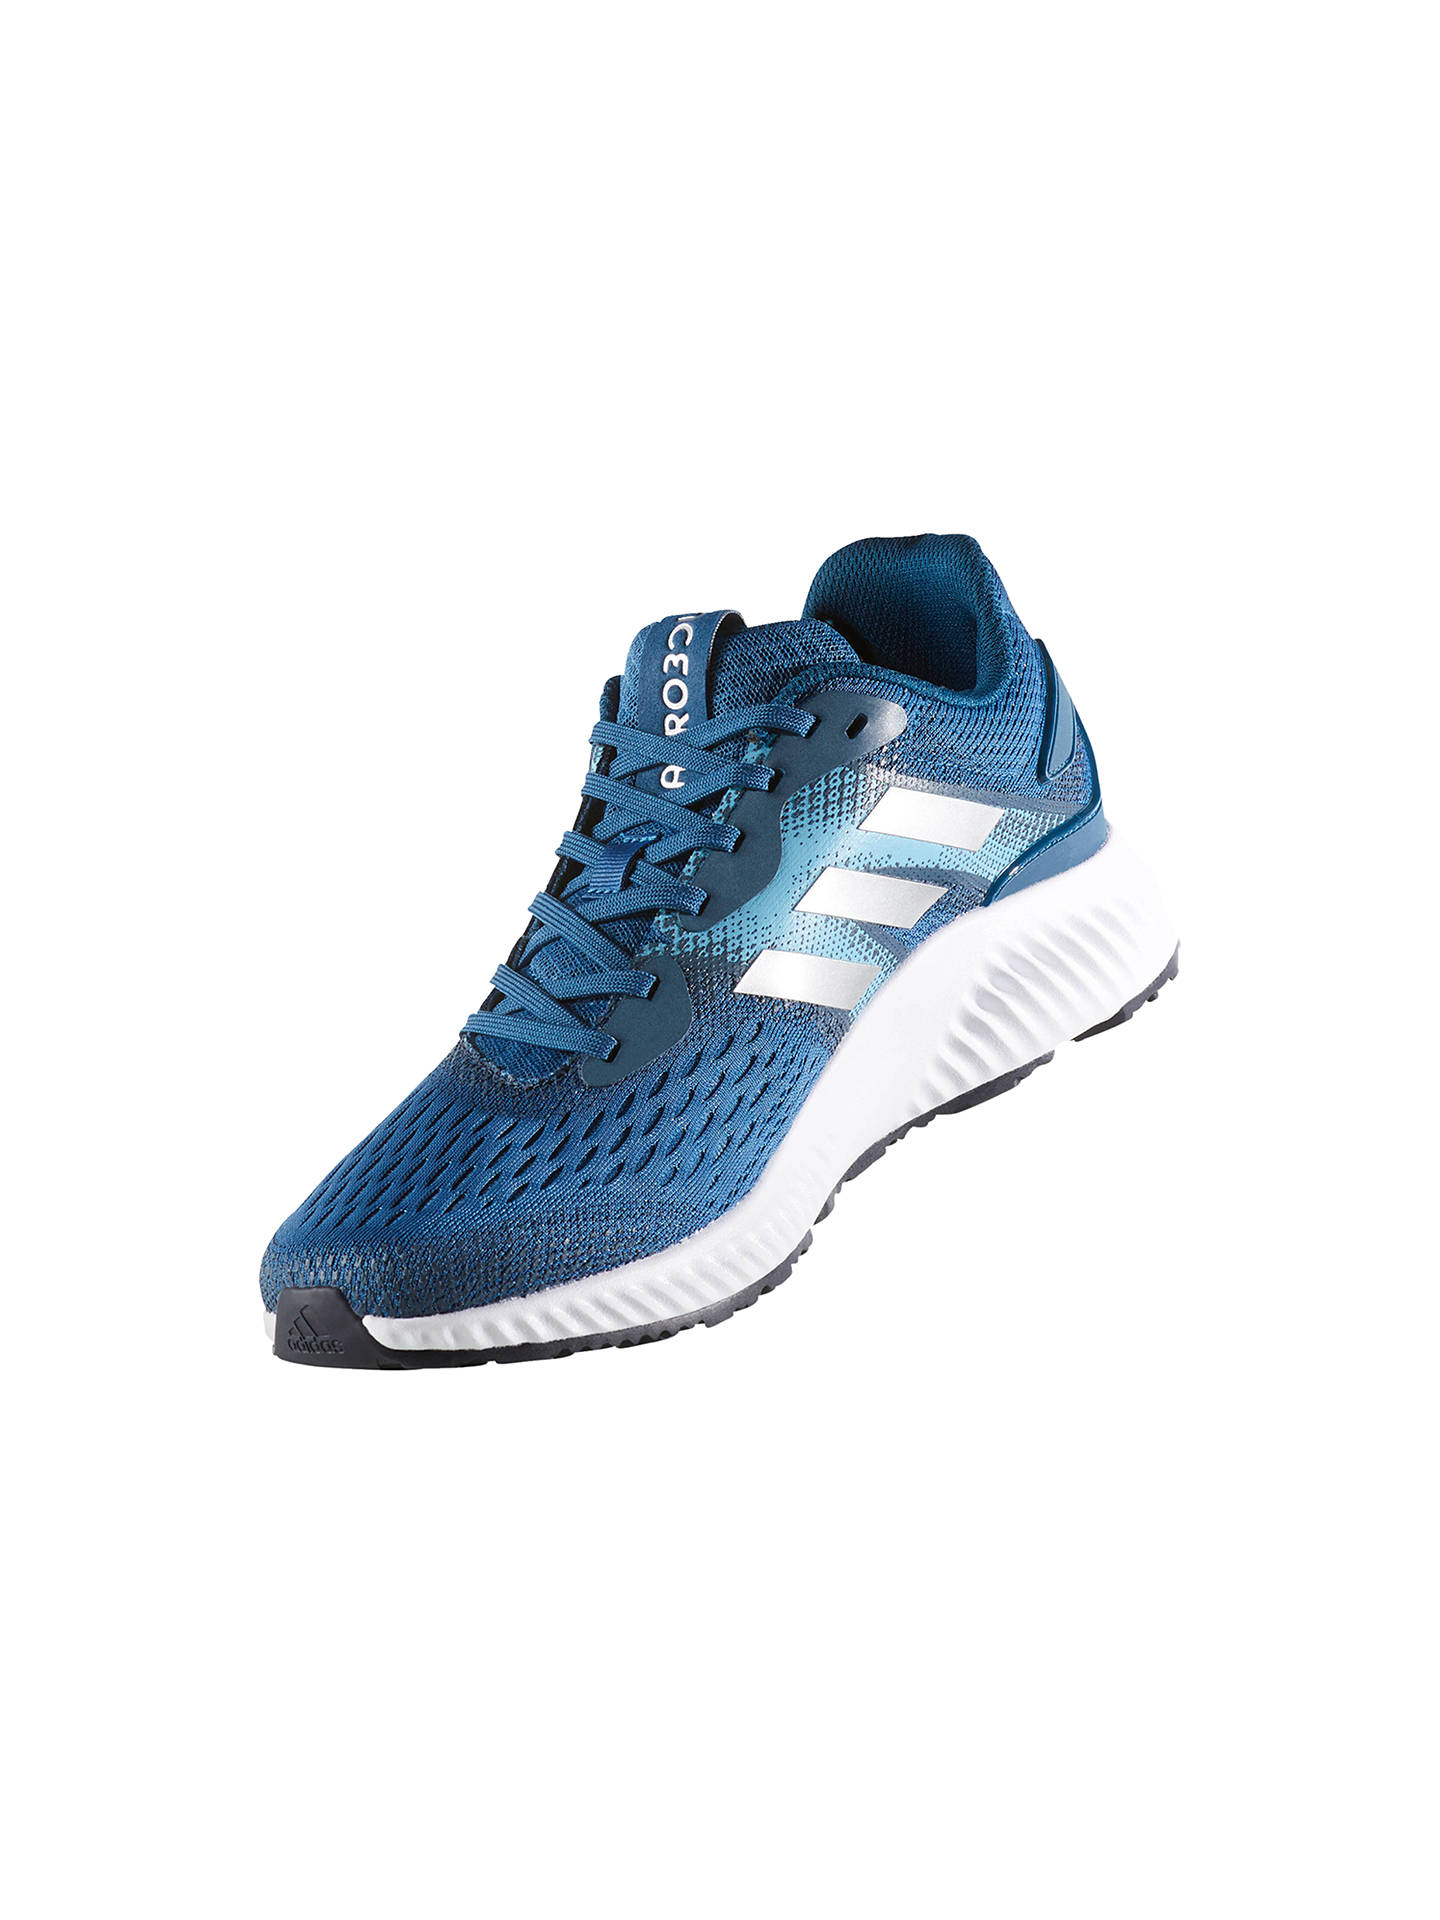 adidas Aerobounce Men's Running Shoes, Blue at John Lewis